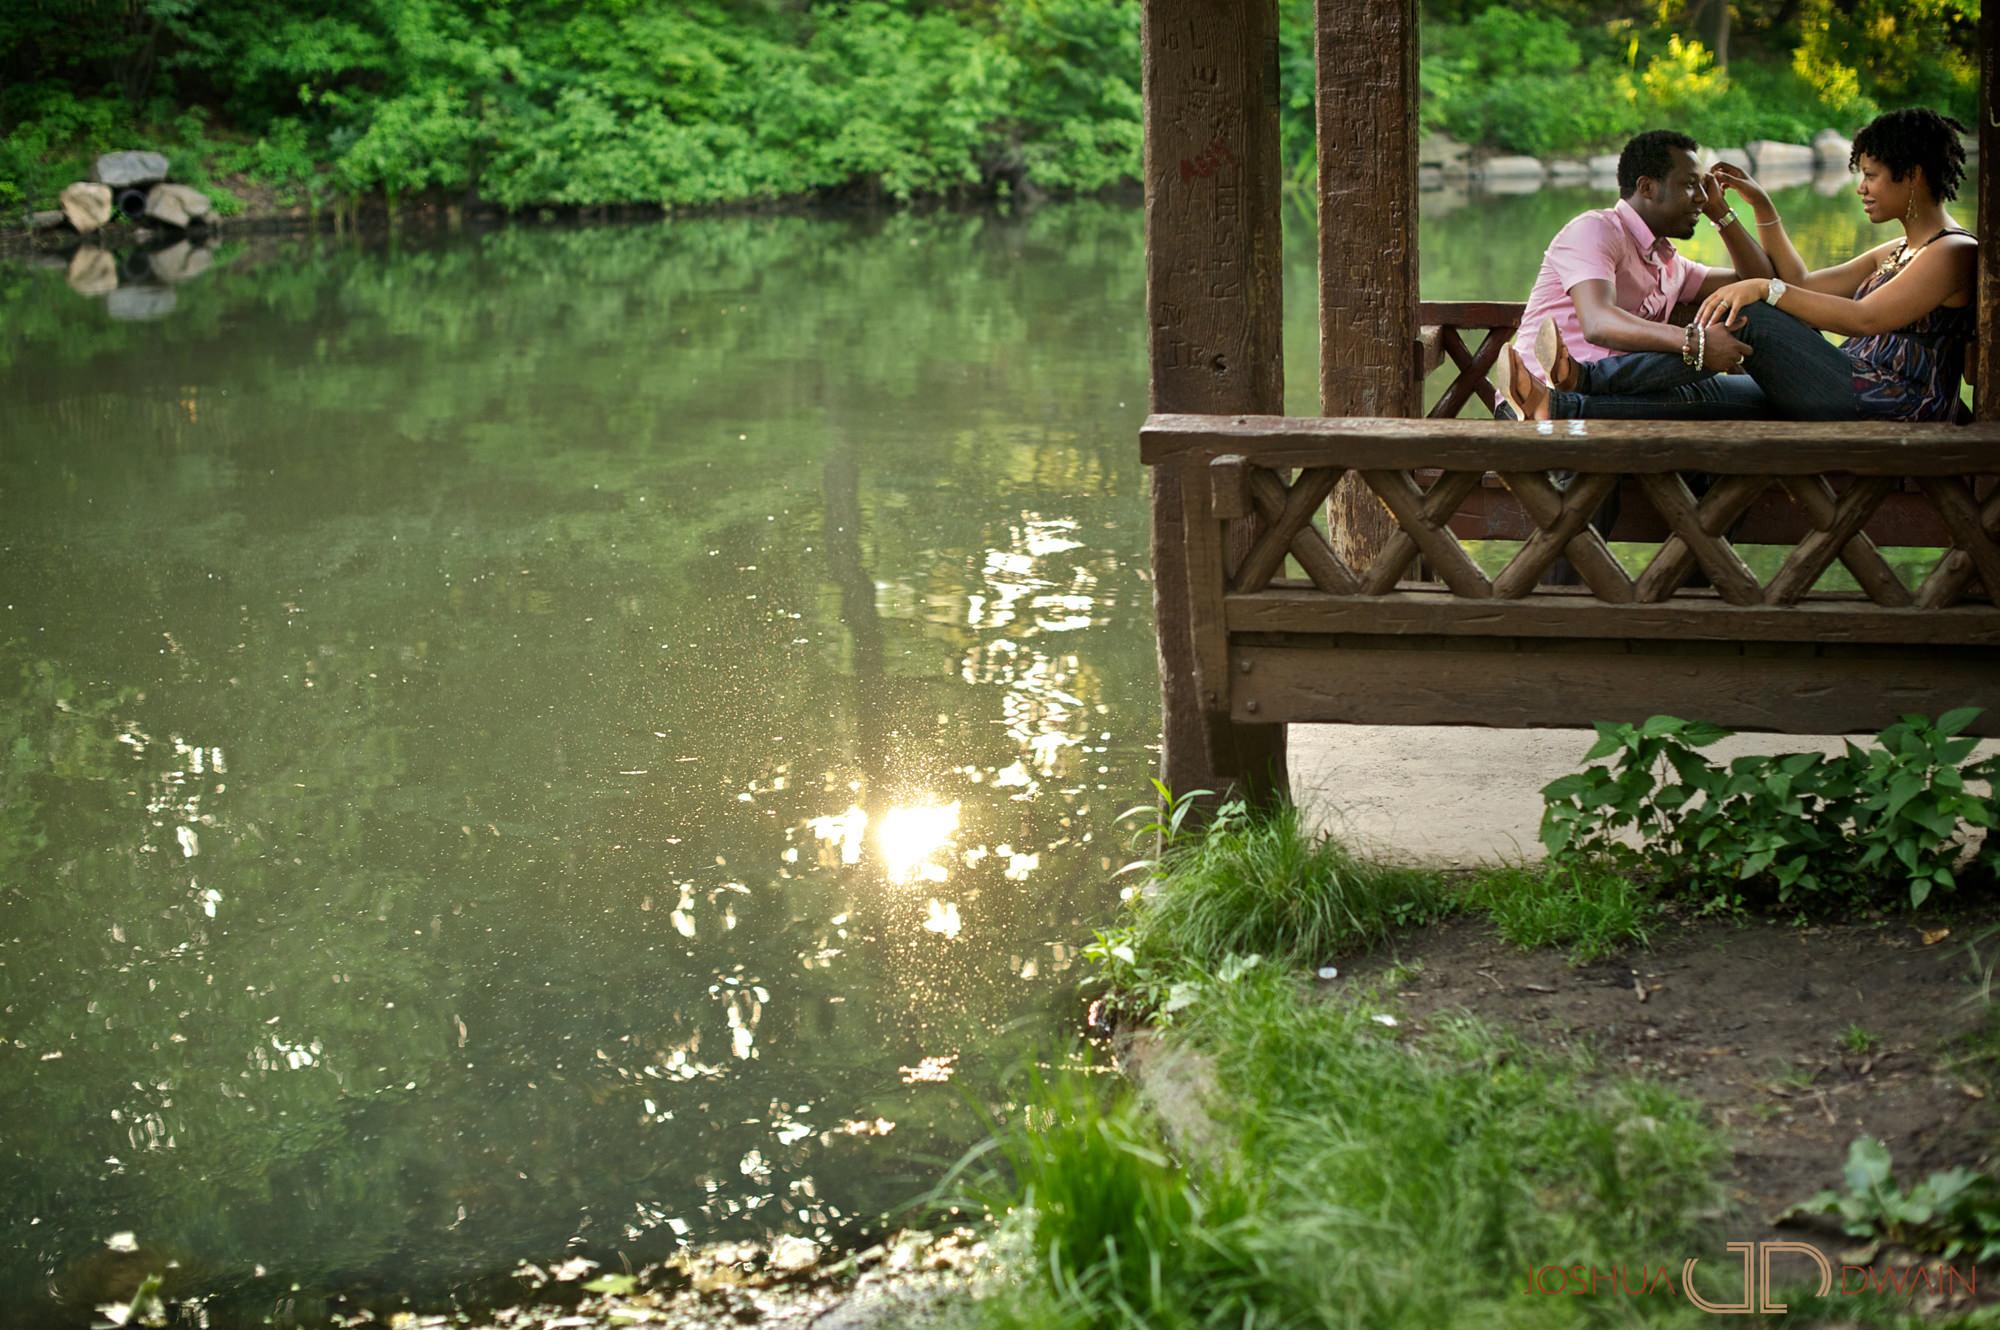 betty-garnel-005-central-park-new-york-city-ny-engagement-photographer-joshua-dwain-20110527_bg_040